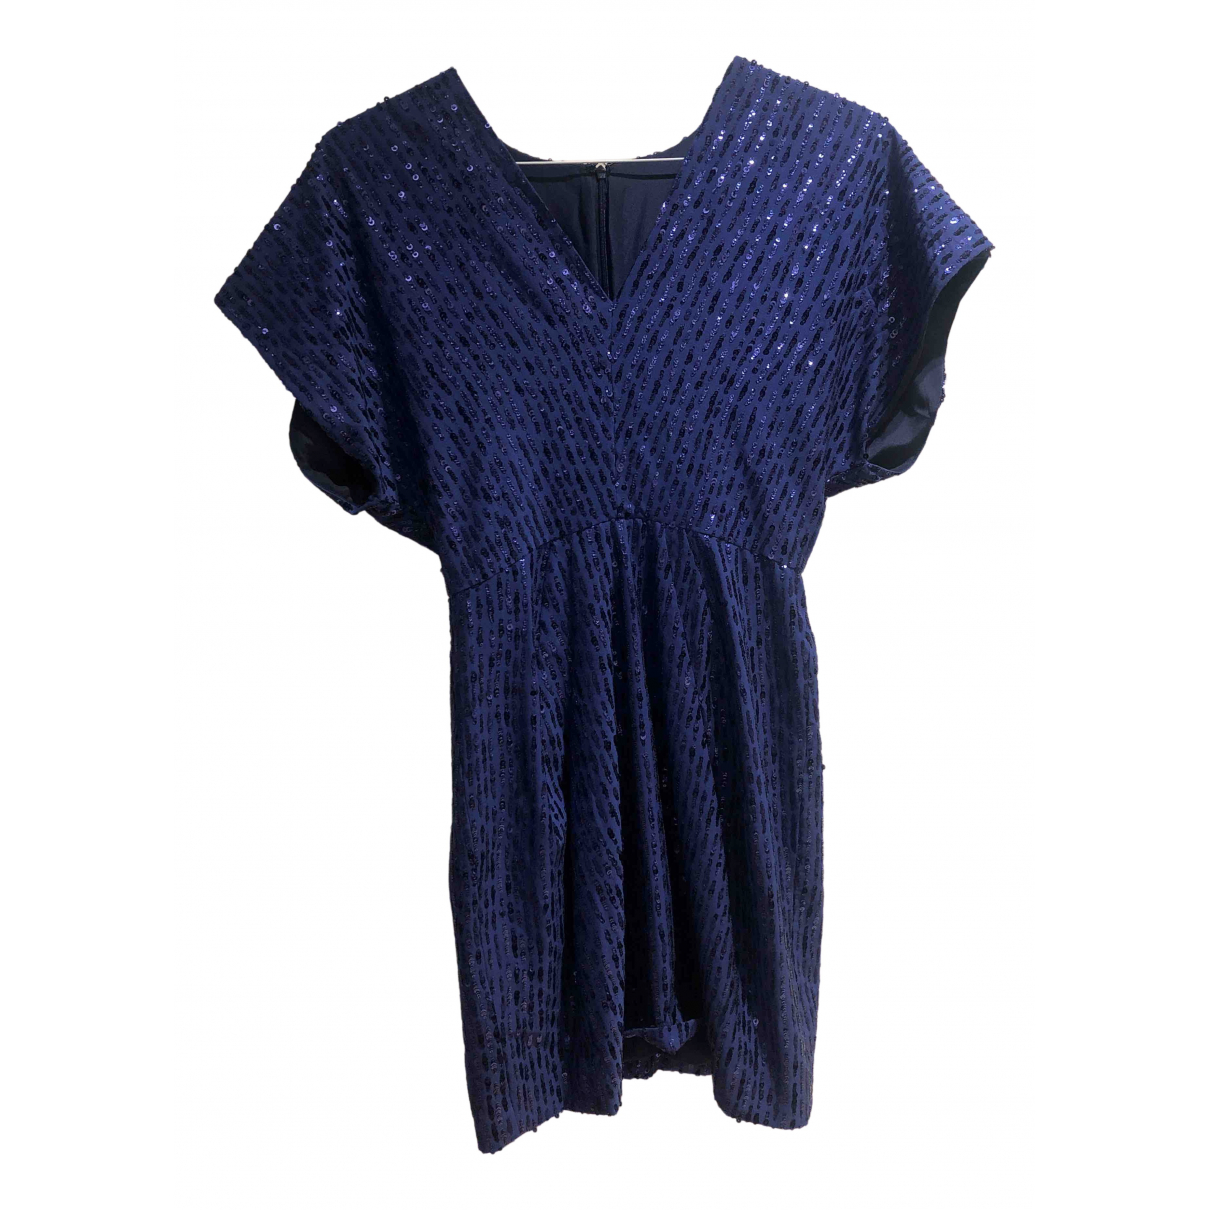 Nina Ricci \N Blue dress for Women 36 FR